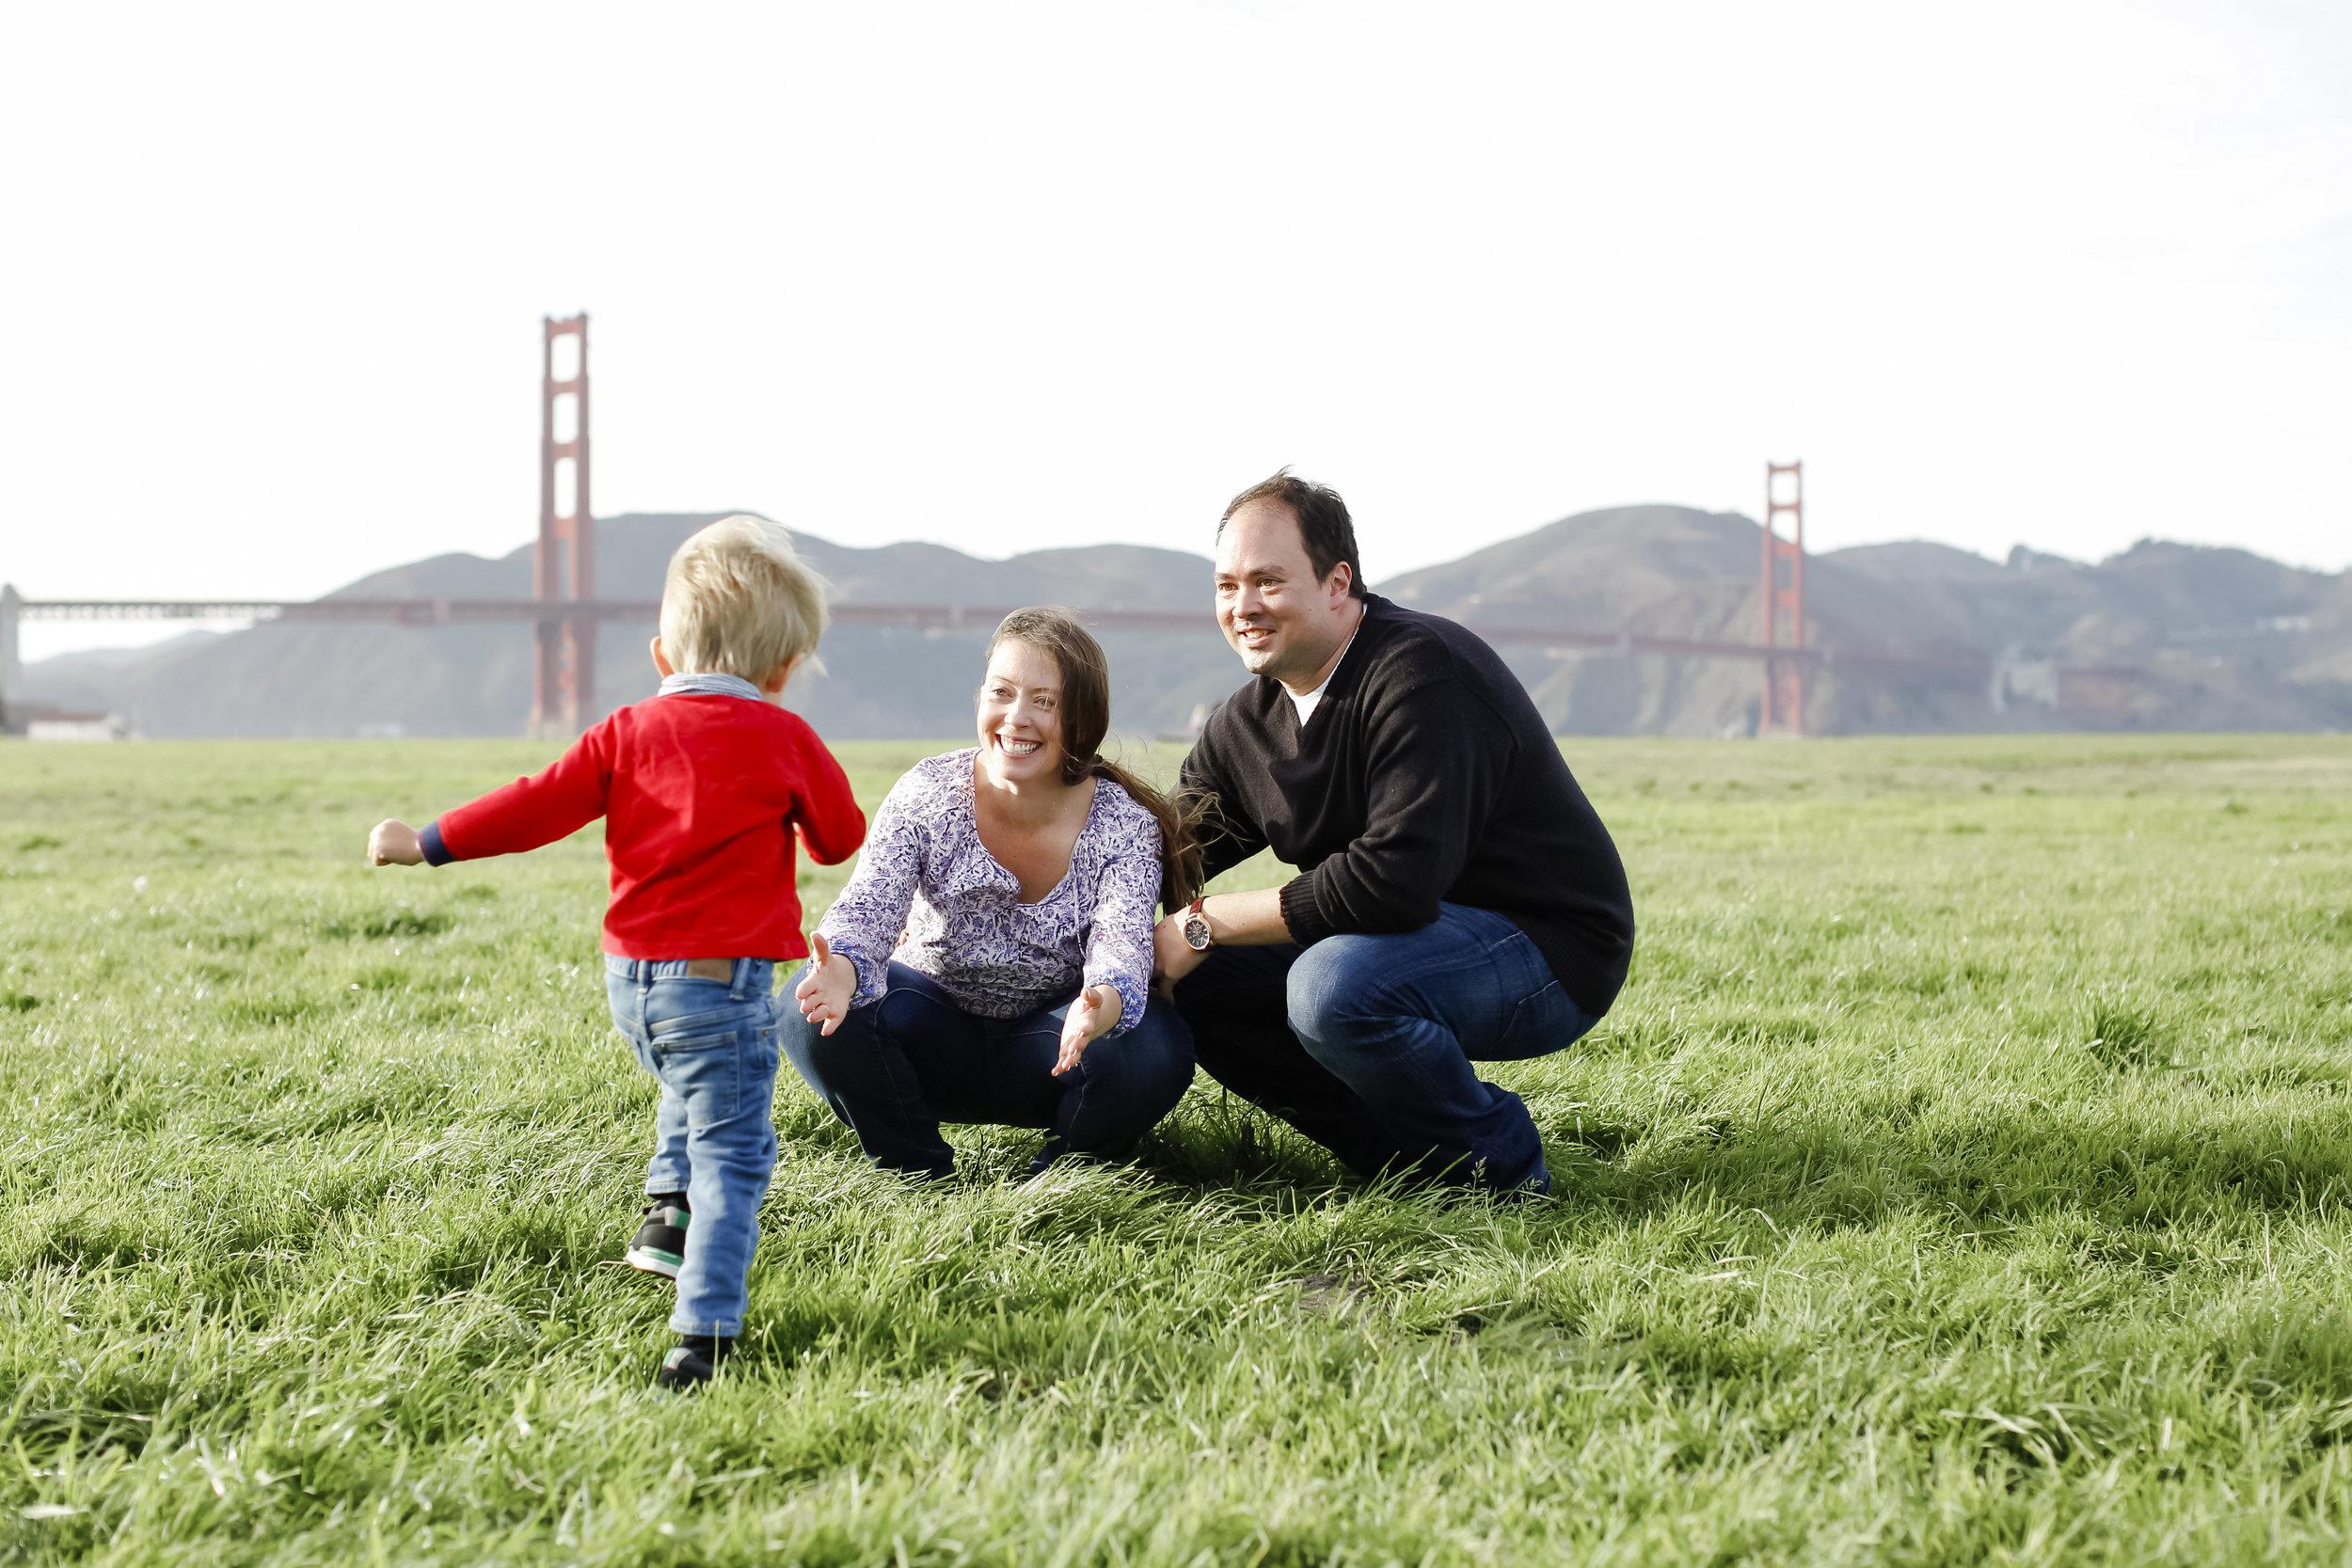 dumvillefamily-ahp-00042.jpg